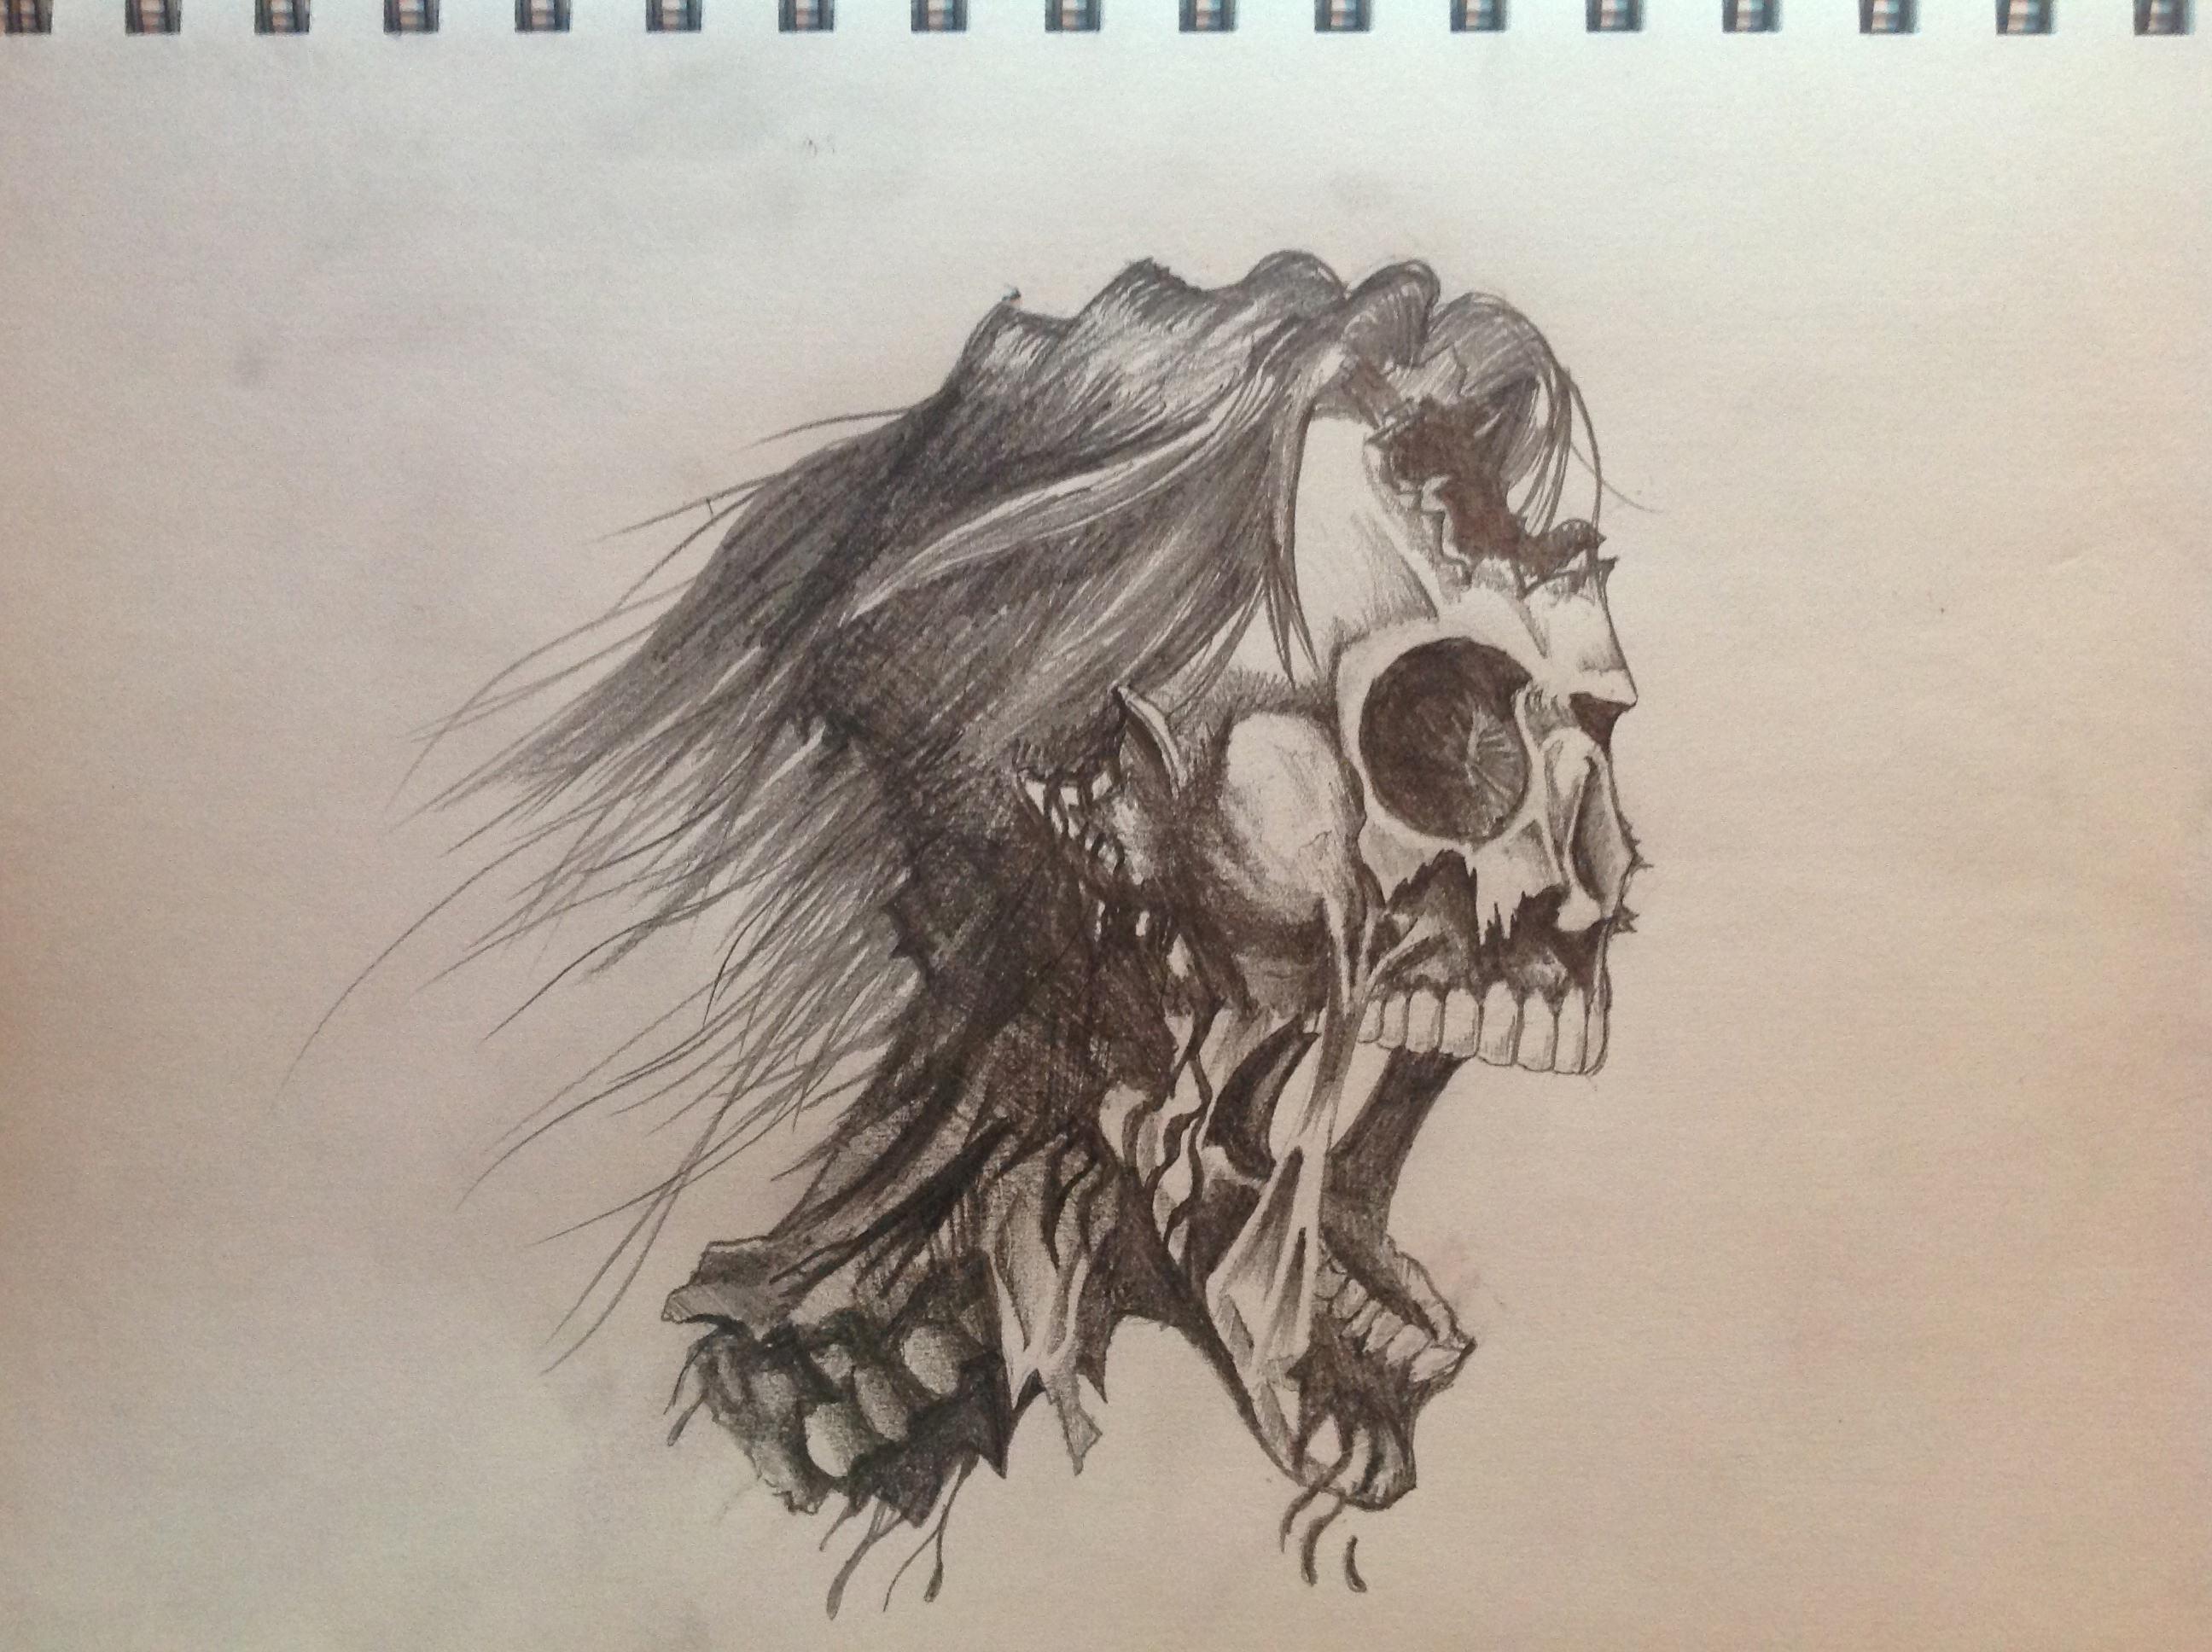 Drawn art dildo galleries 22